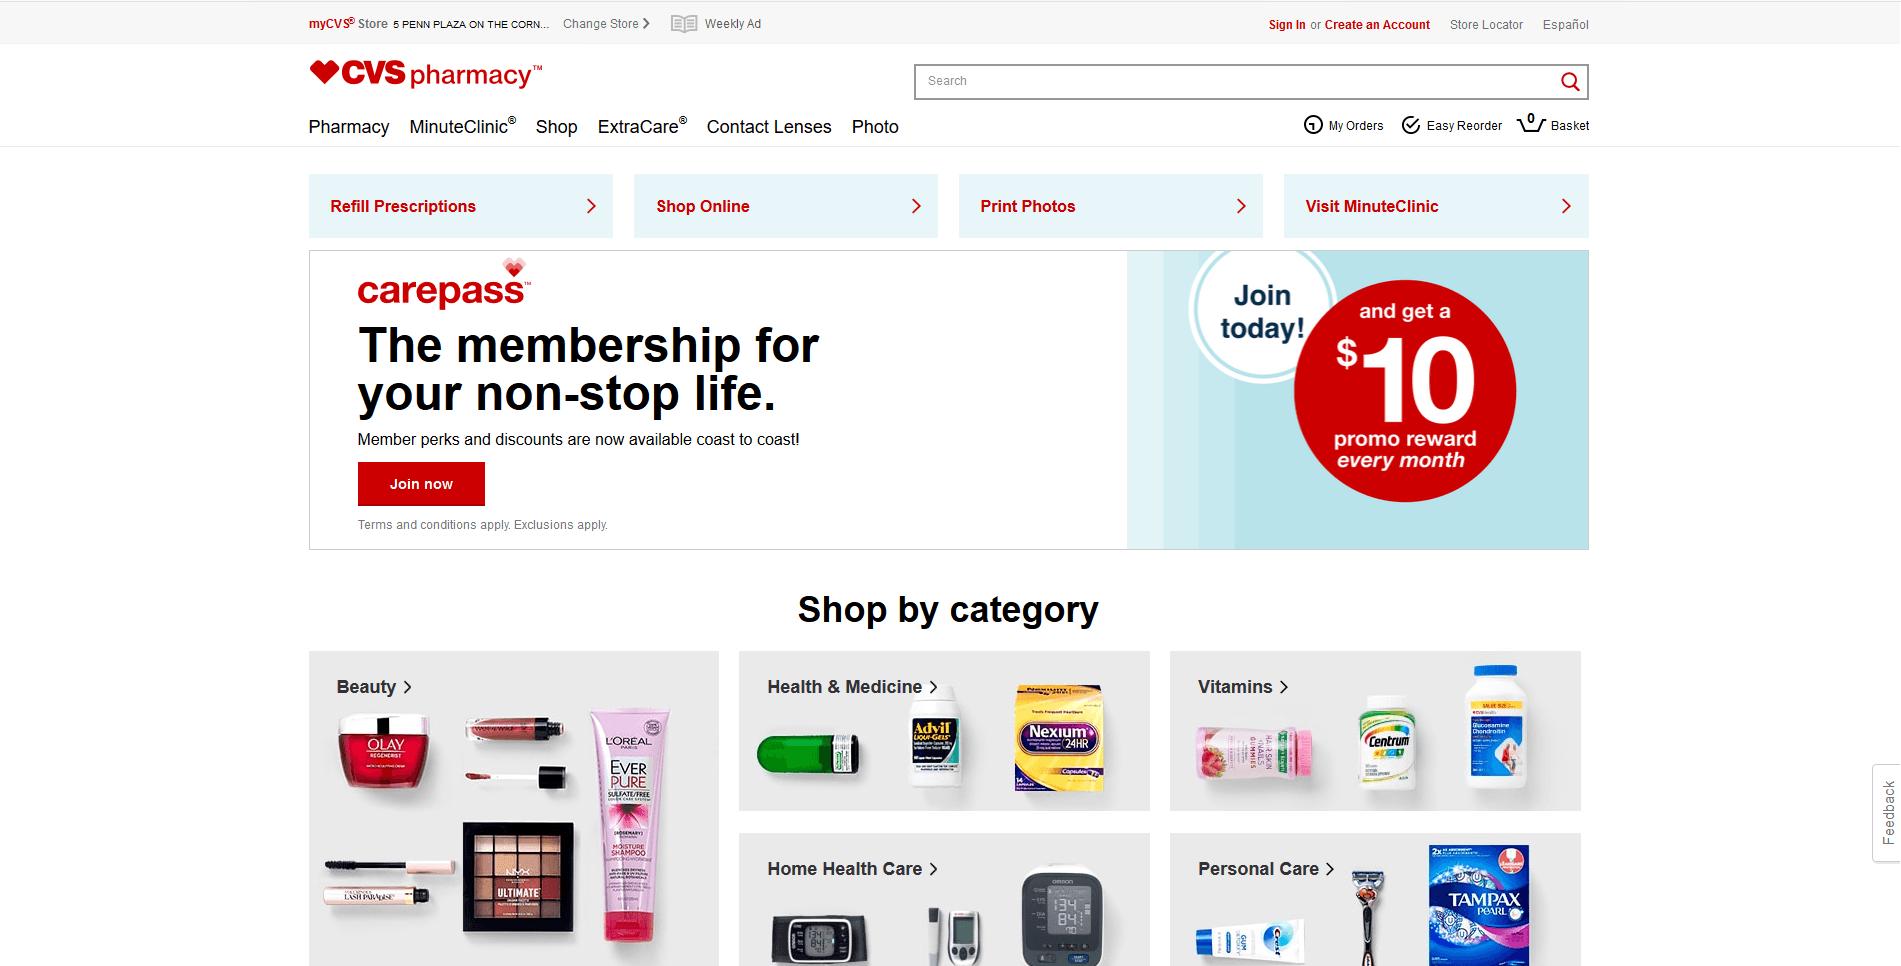 cvs' websites picture